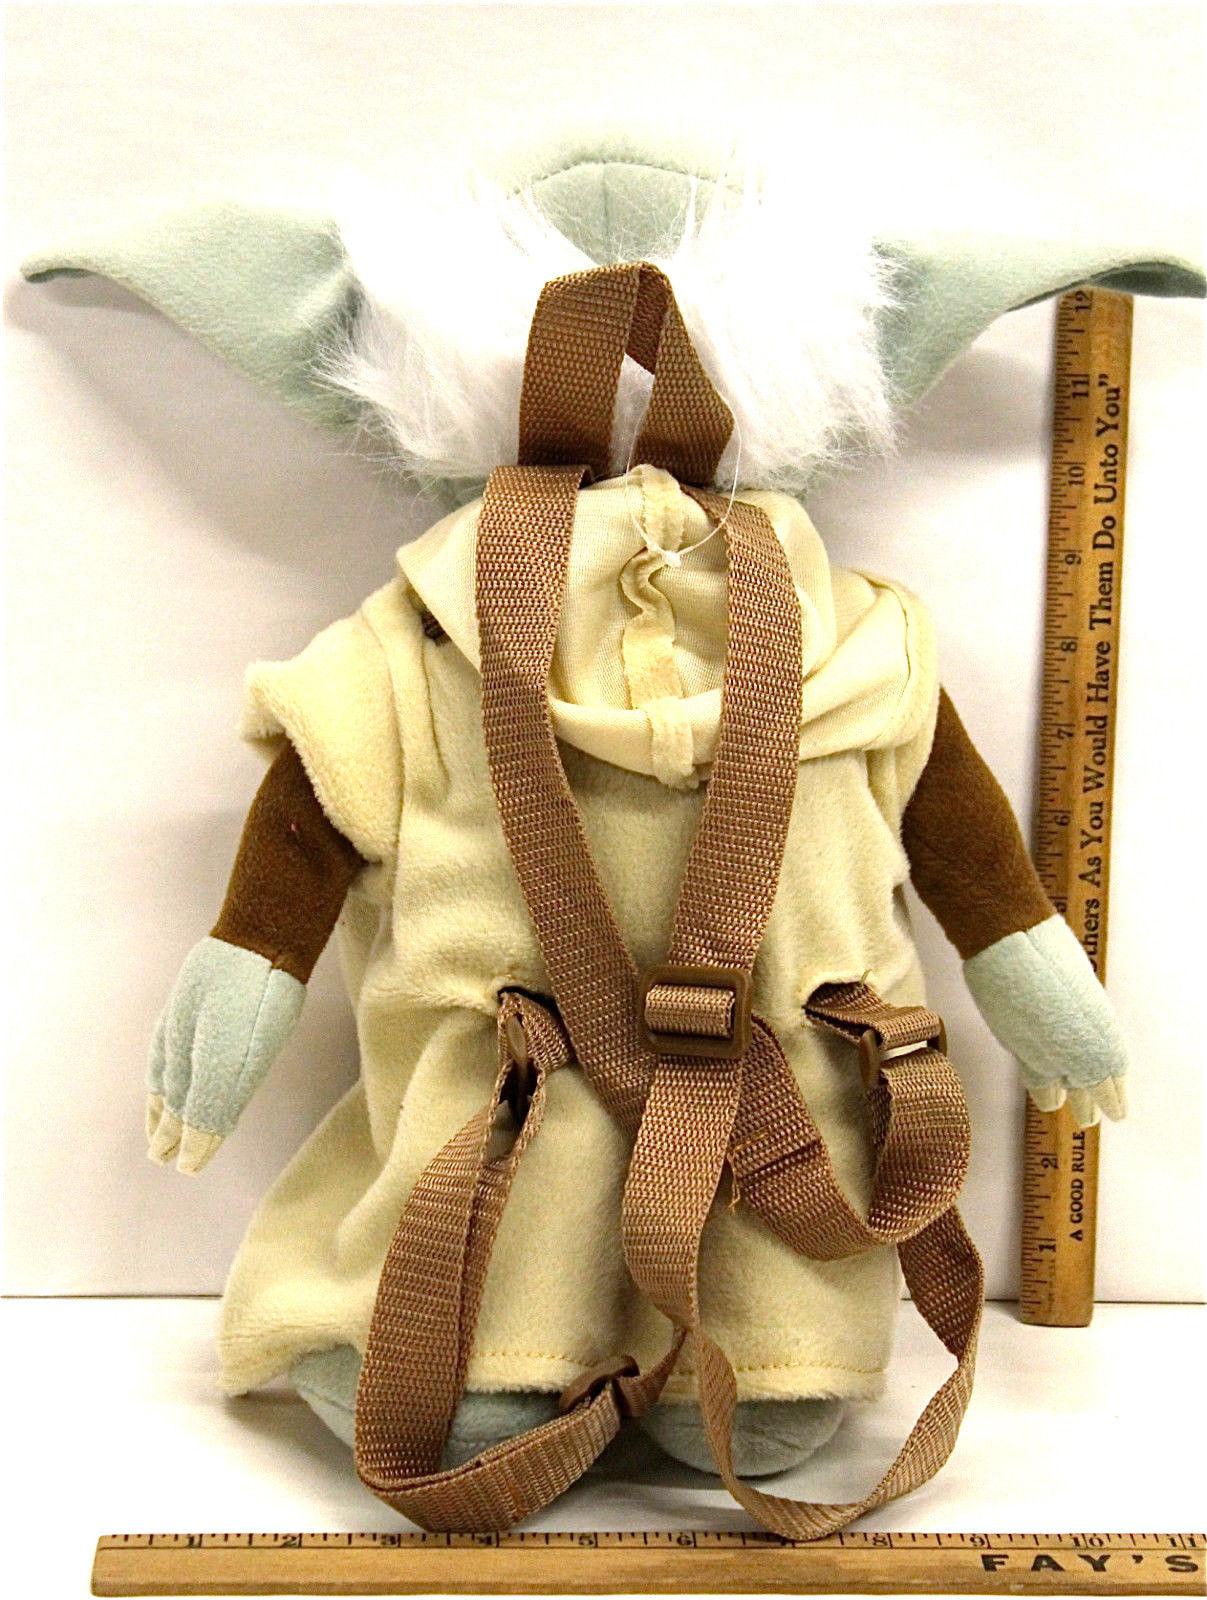 Star Wars Yoda Childrens Plush Stuffed Animal Backpack w/ Zipper Pouch Back Bag